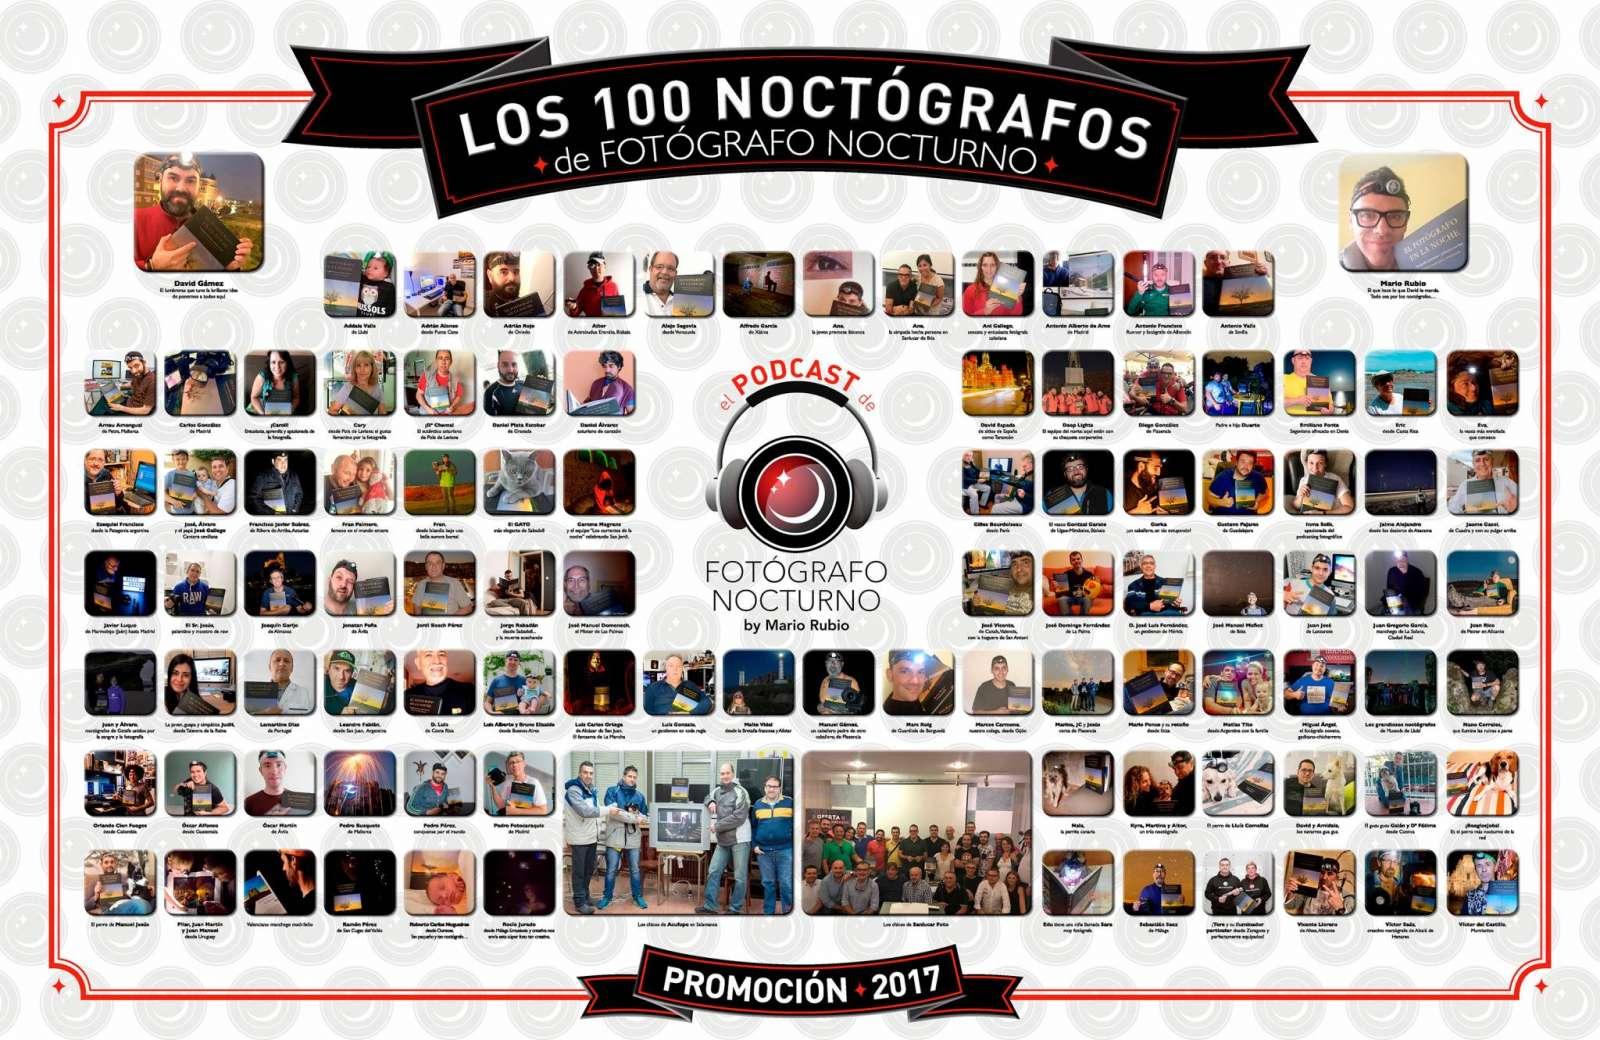 Noctógrafos del Podcast en la red 1